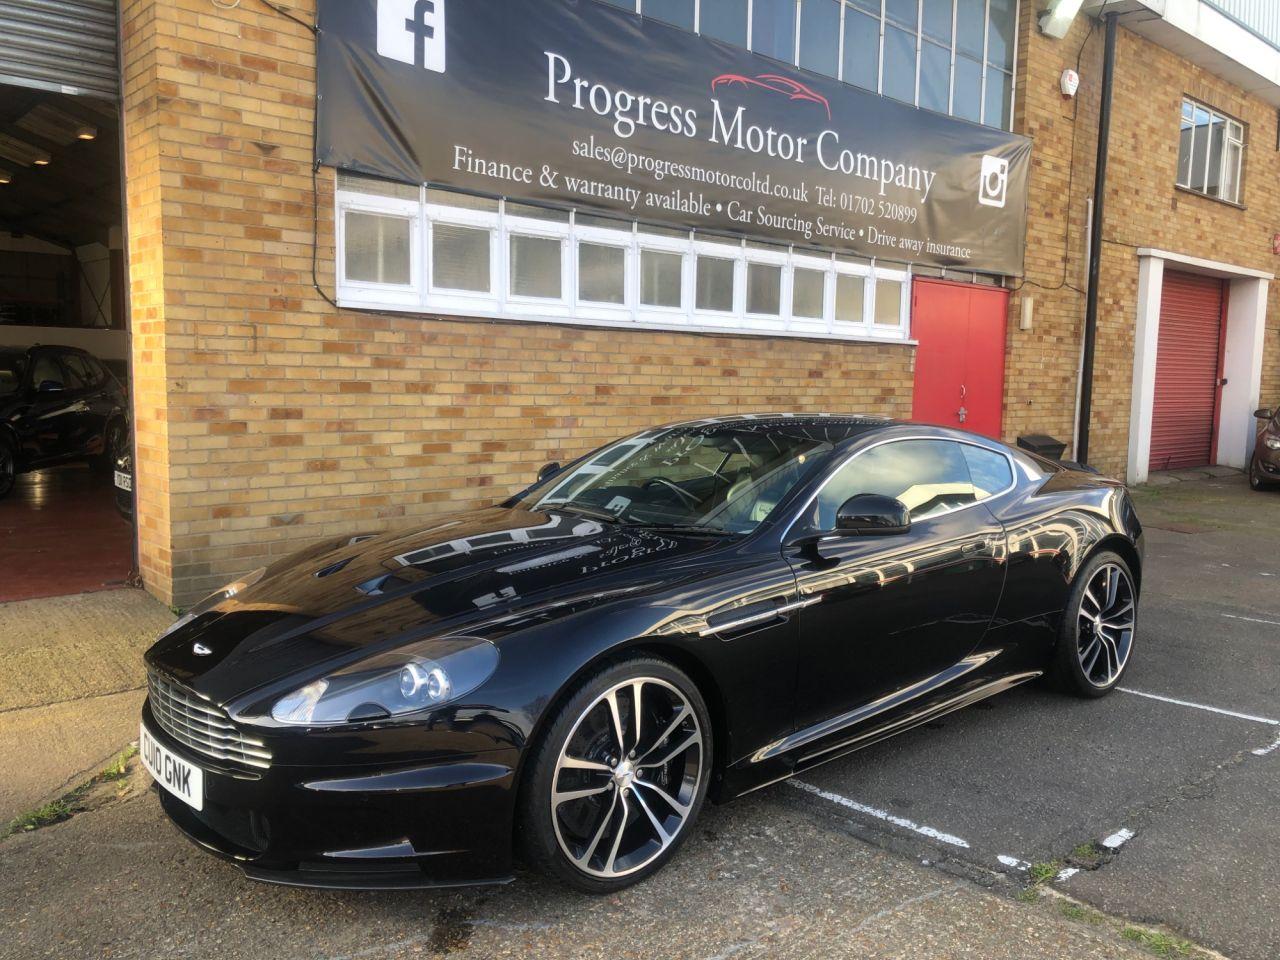 2010 Aston Martin Dbs V12 74 000